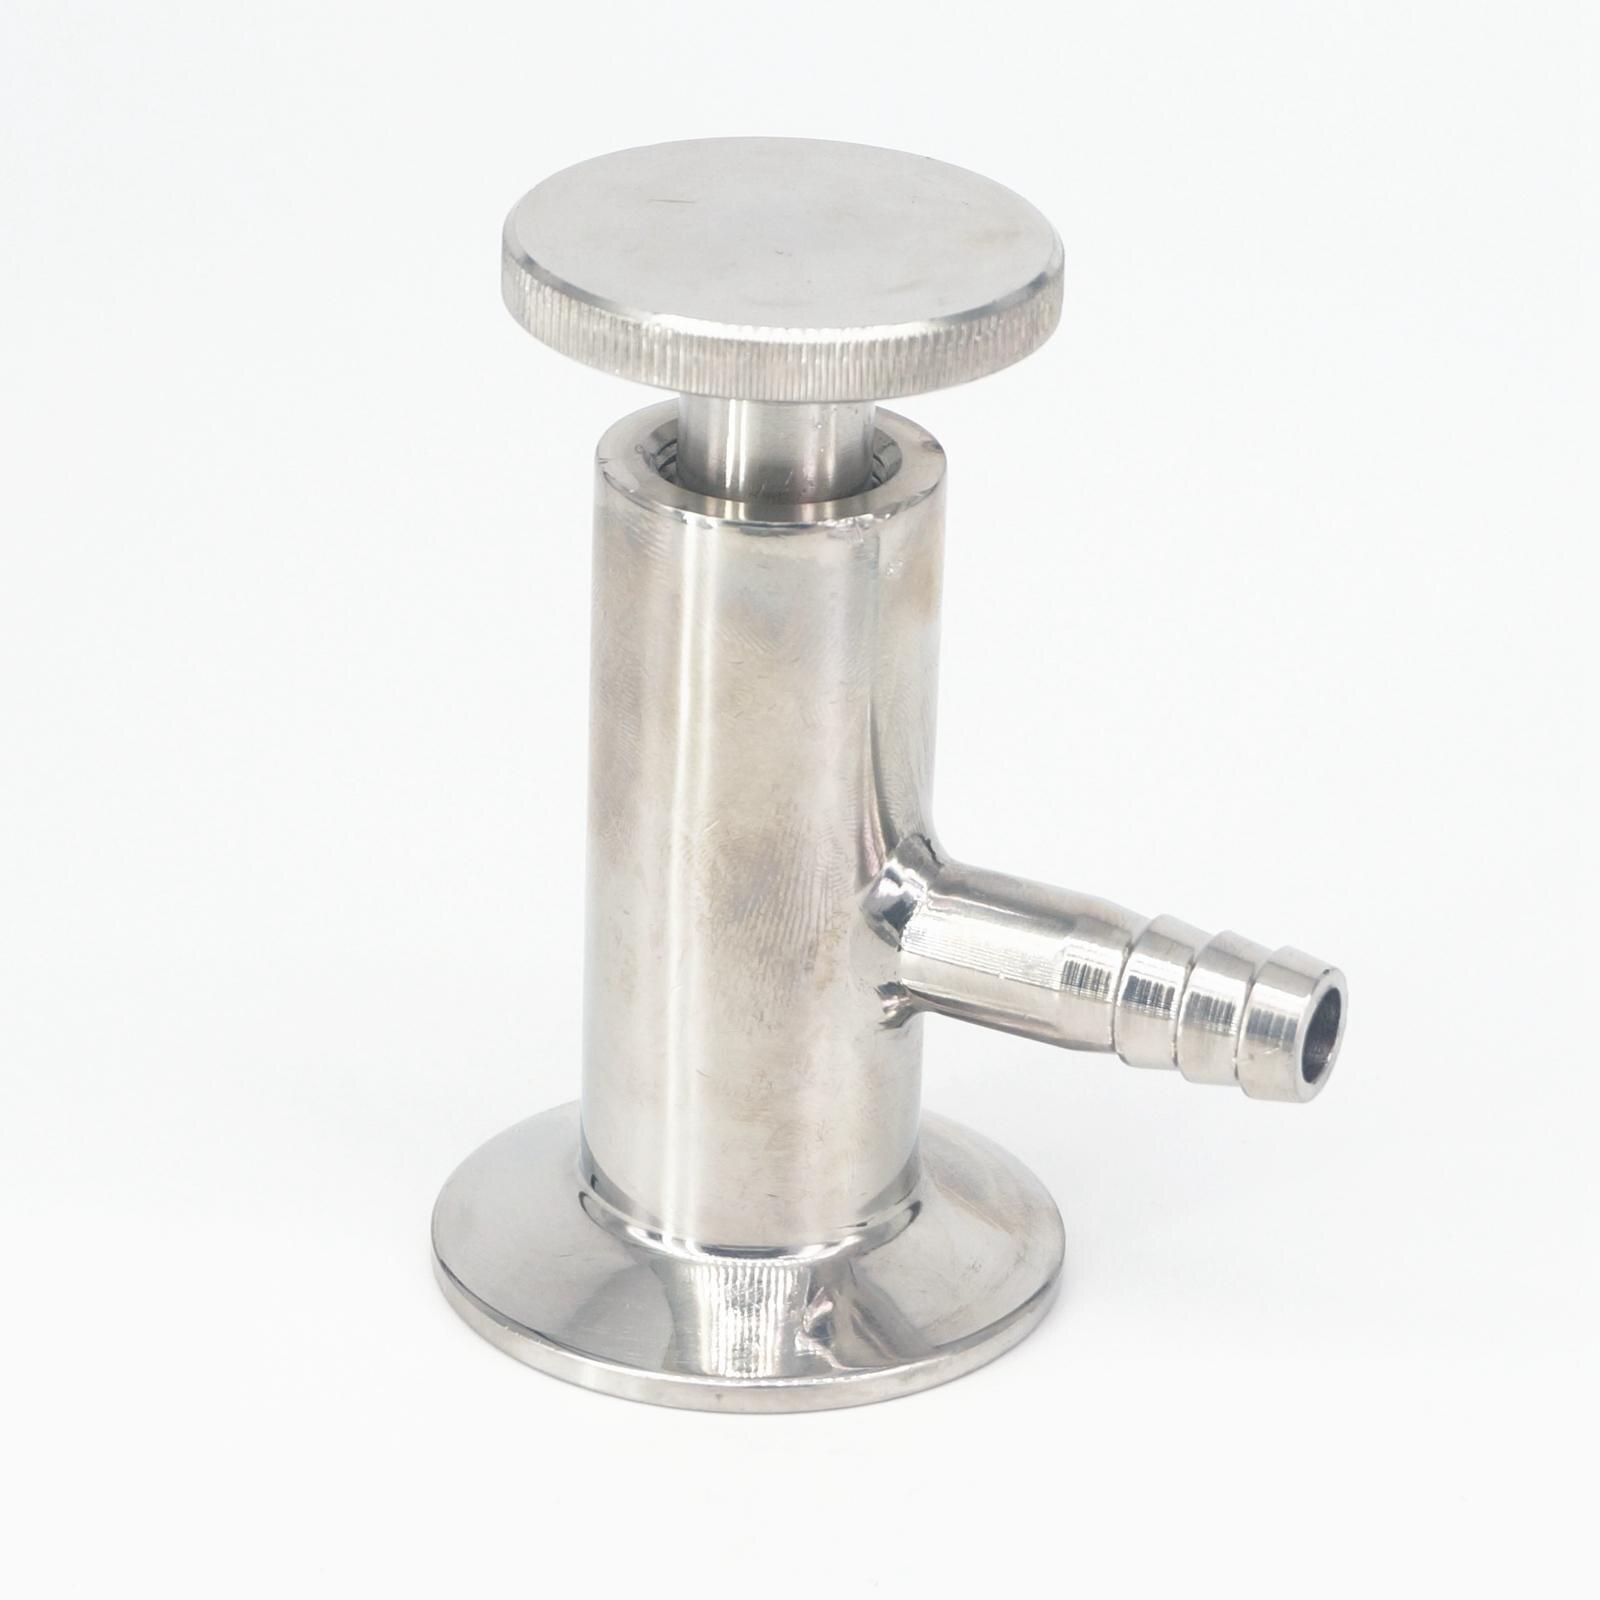 SUS304 Stainless Steel Sanitary 1.5